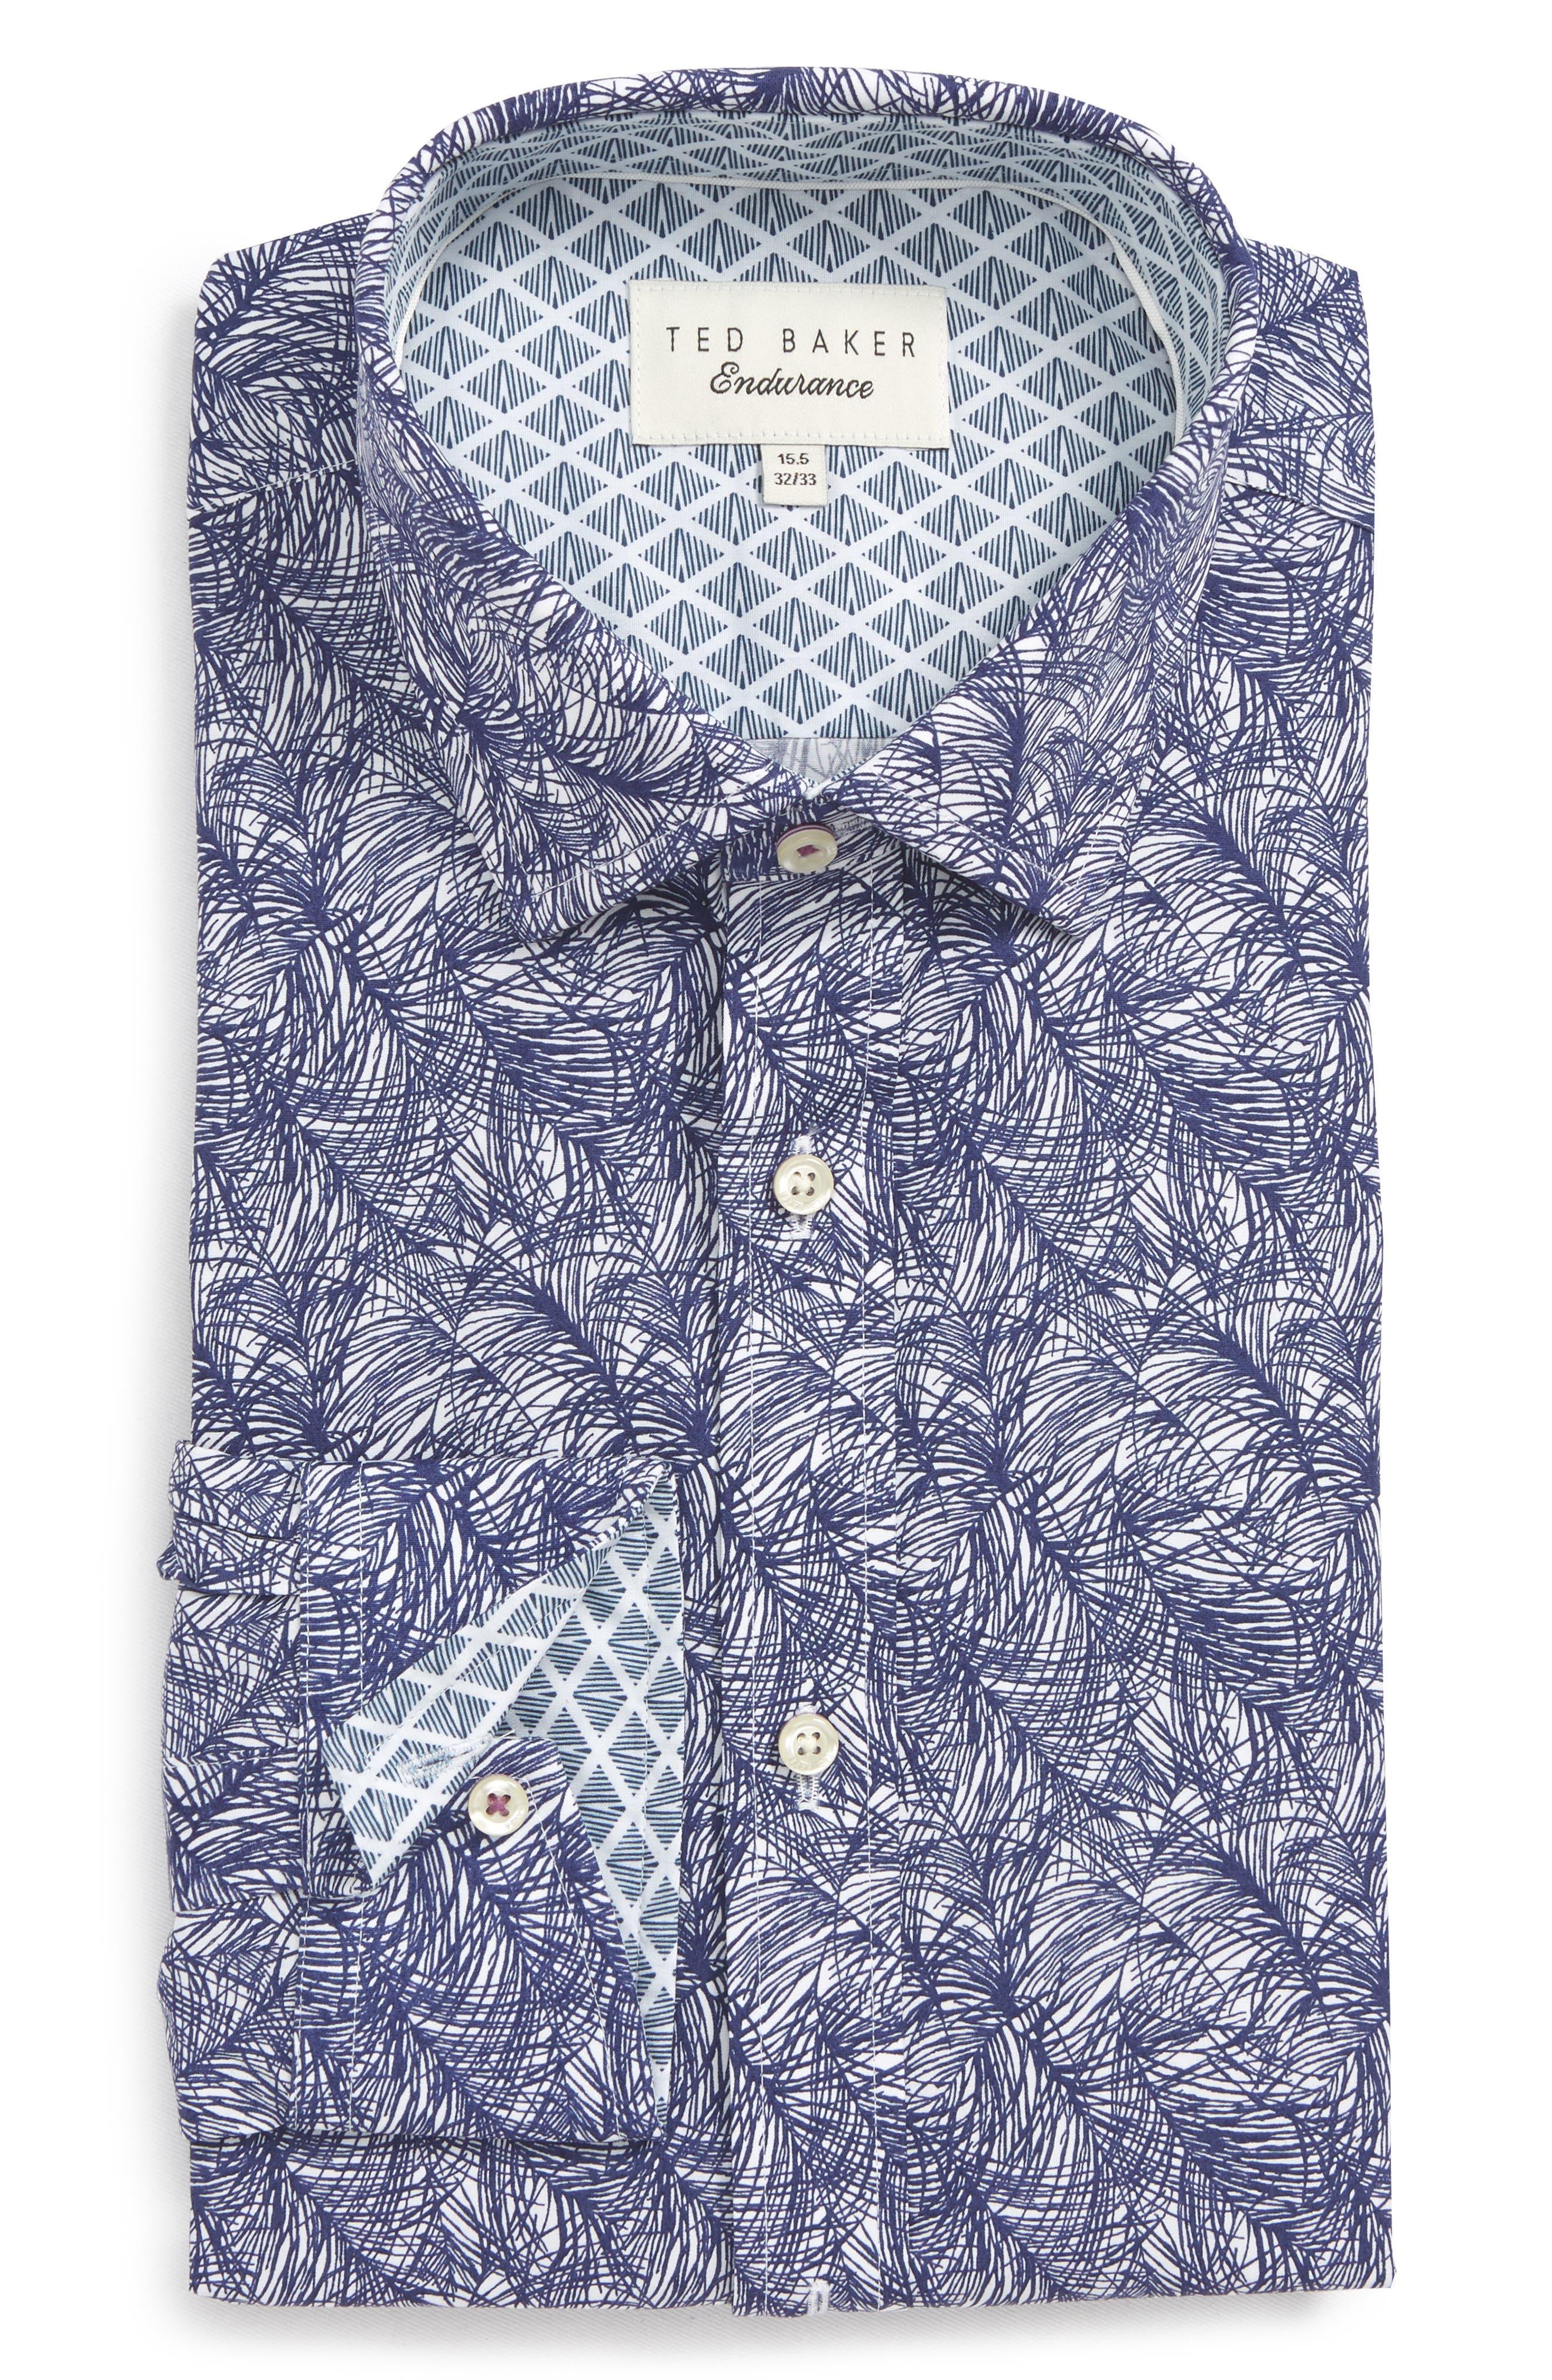 Messera Trim Fit Print Dress Shirt,                         Main,                         color, Navy